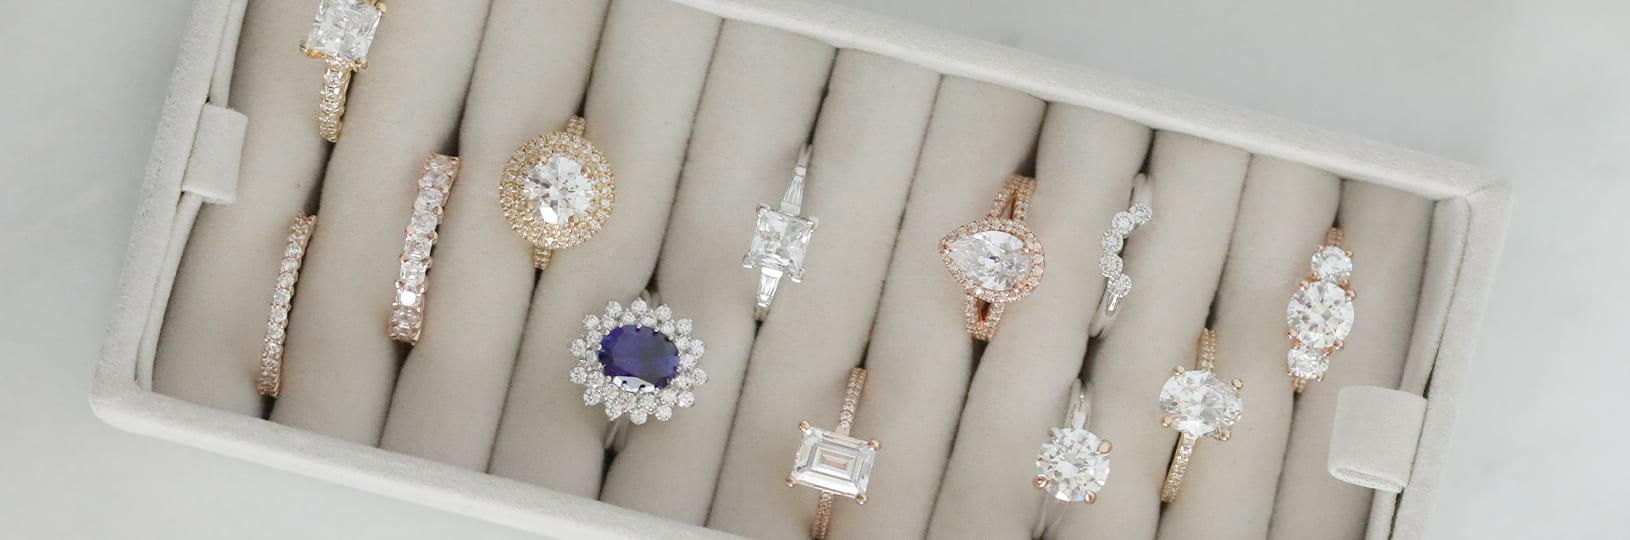 Online engagement rings.